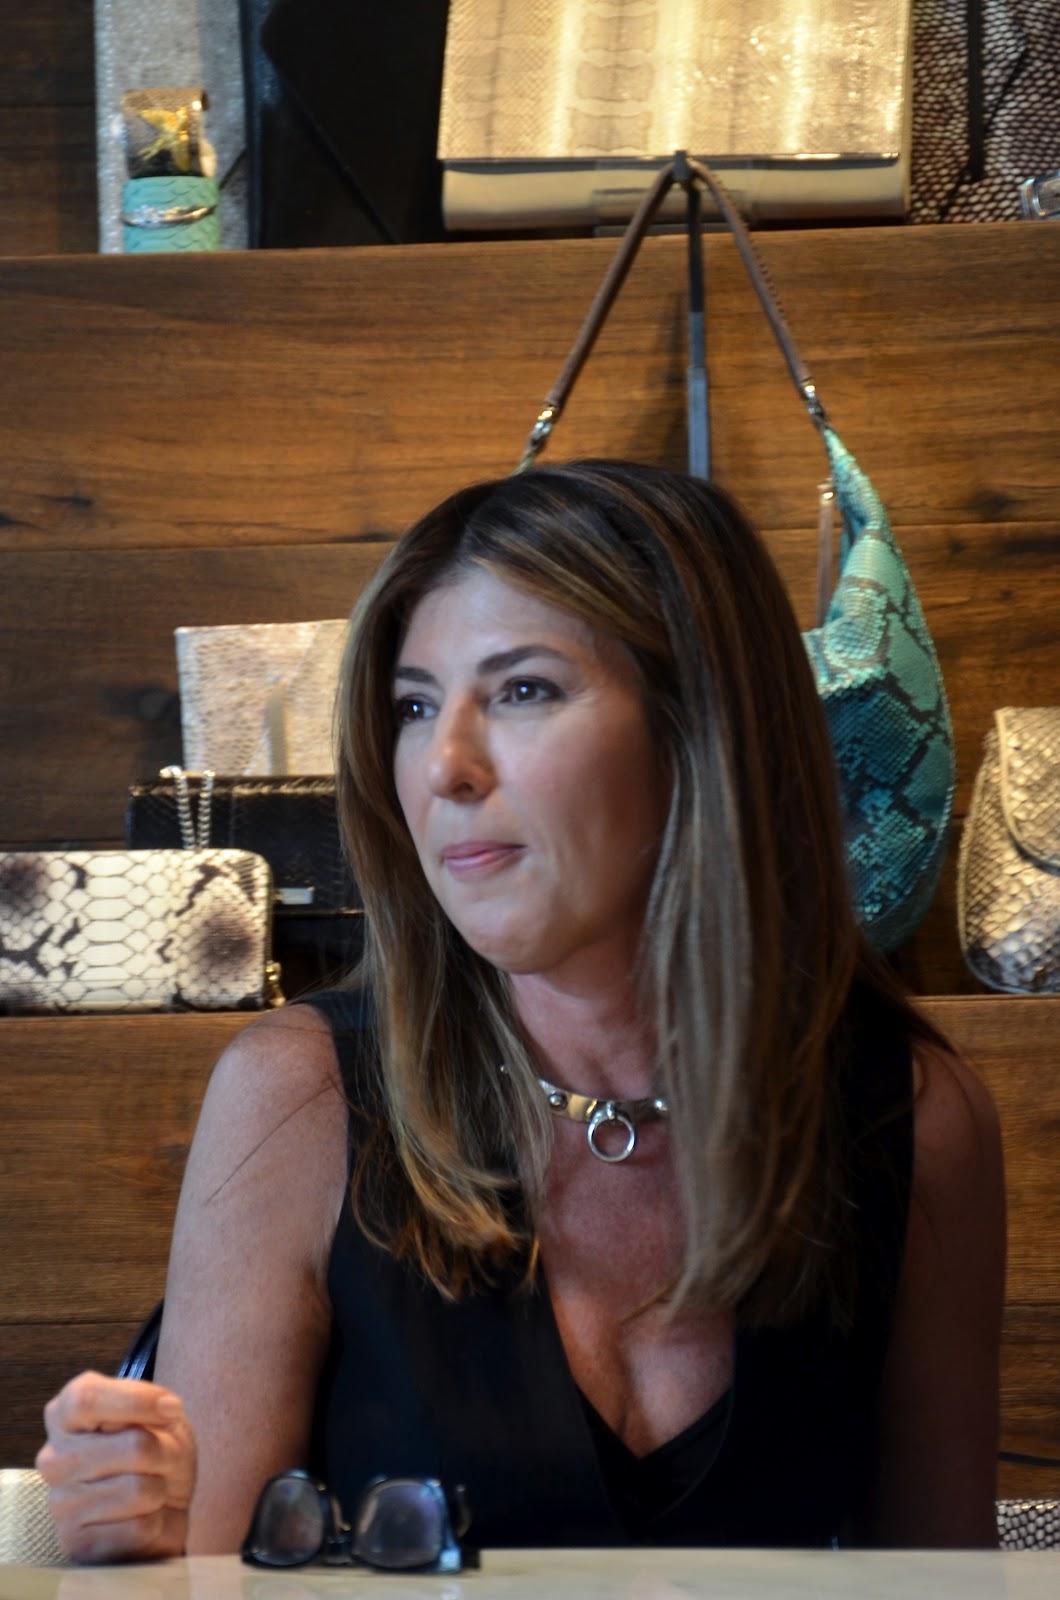 Nina Garcia s Best Style Tips - How to Dress Like a Fashion Editor 64